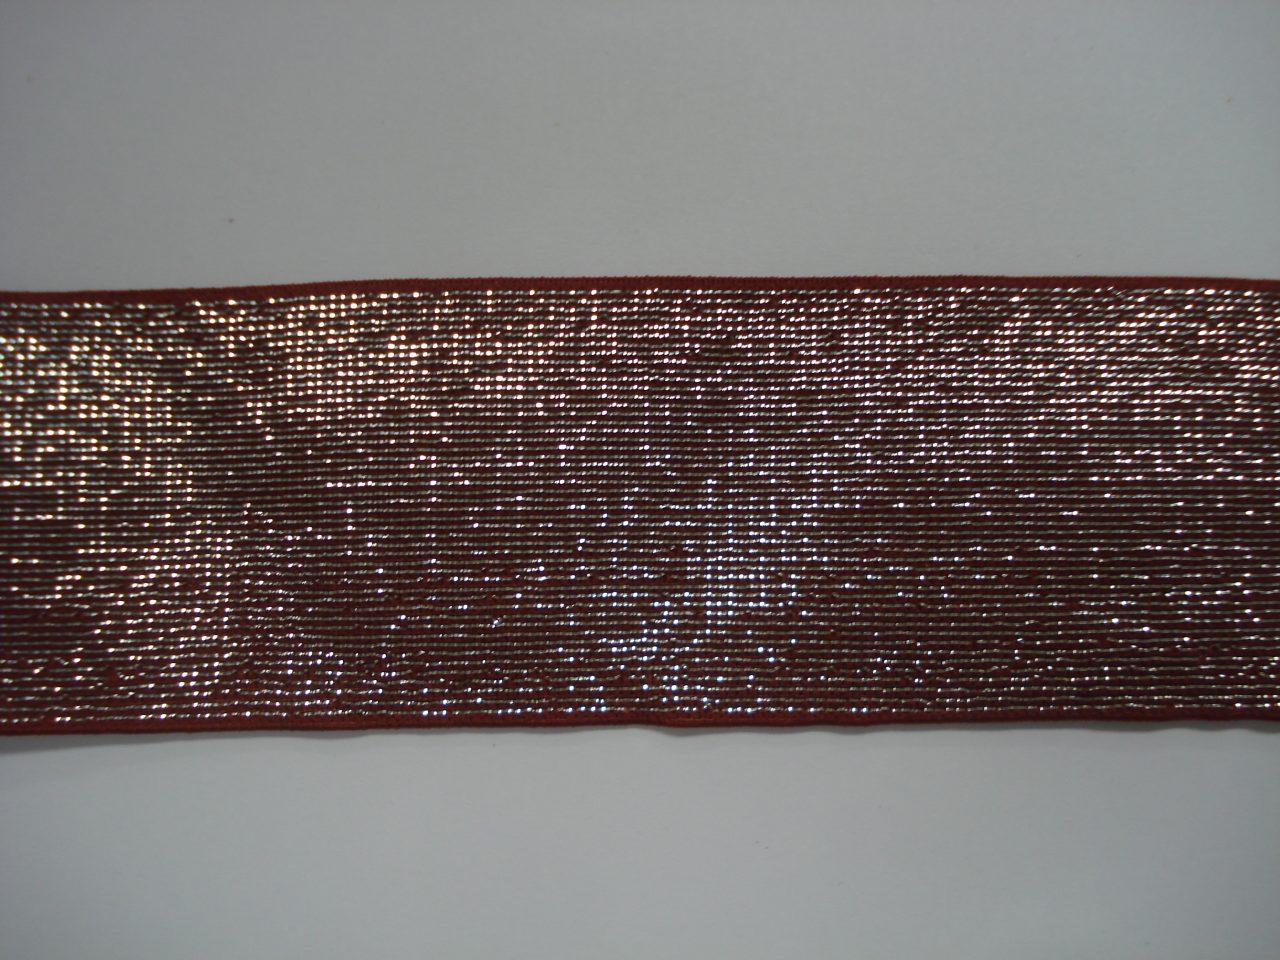 Glitter Elastiek 40mm rood/zilver €3,50 p/m